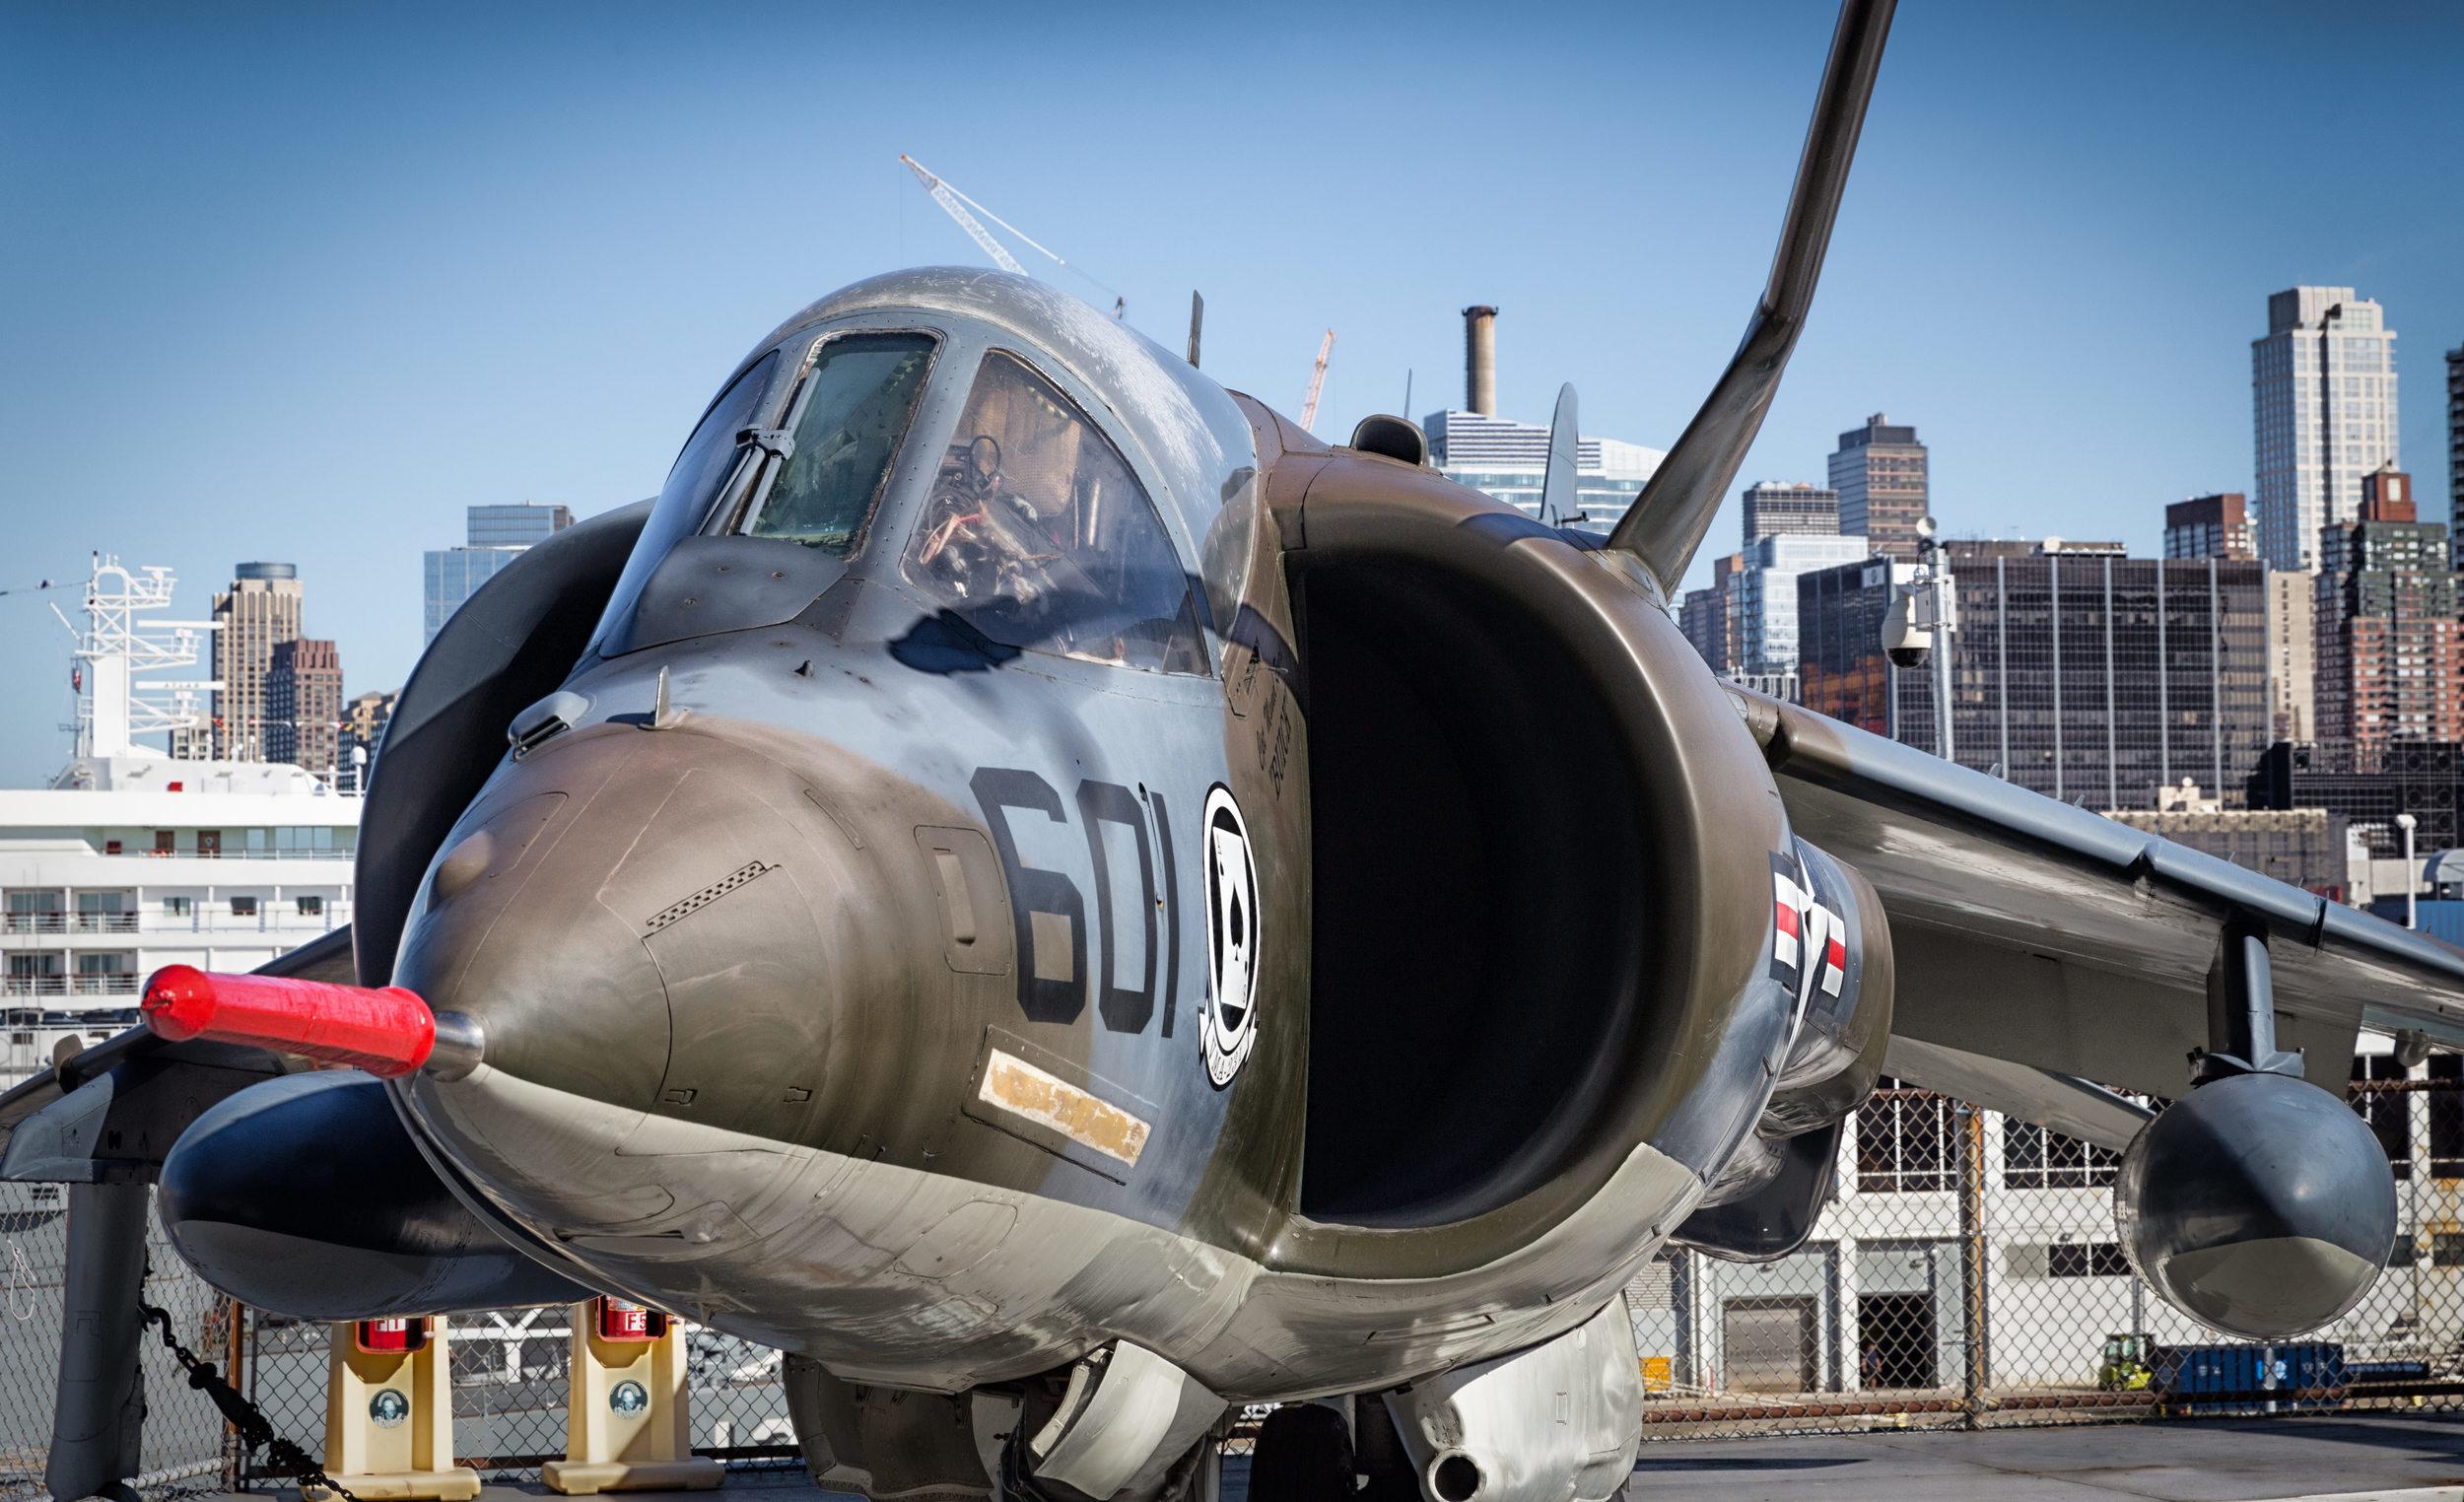 Harrier VTOL jumpjet